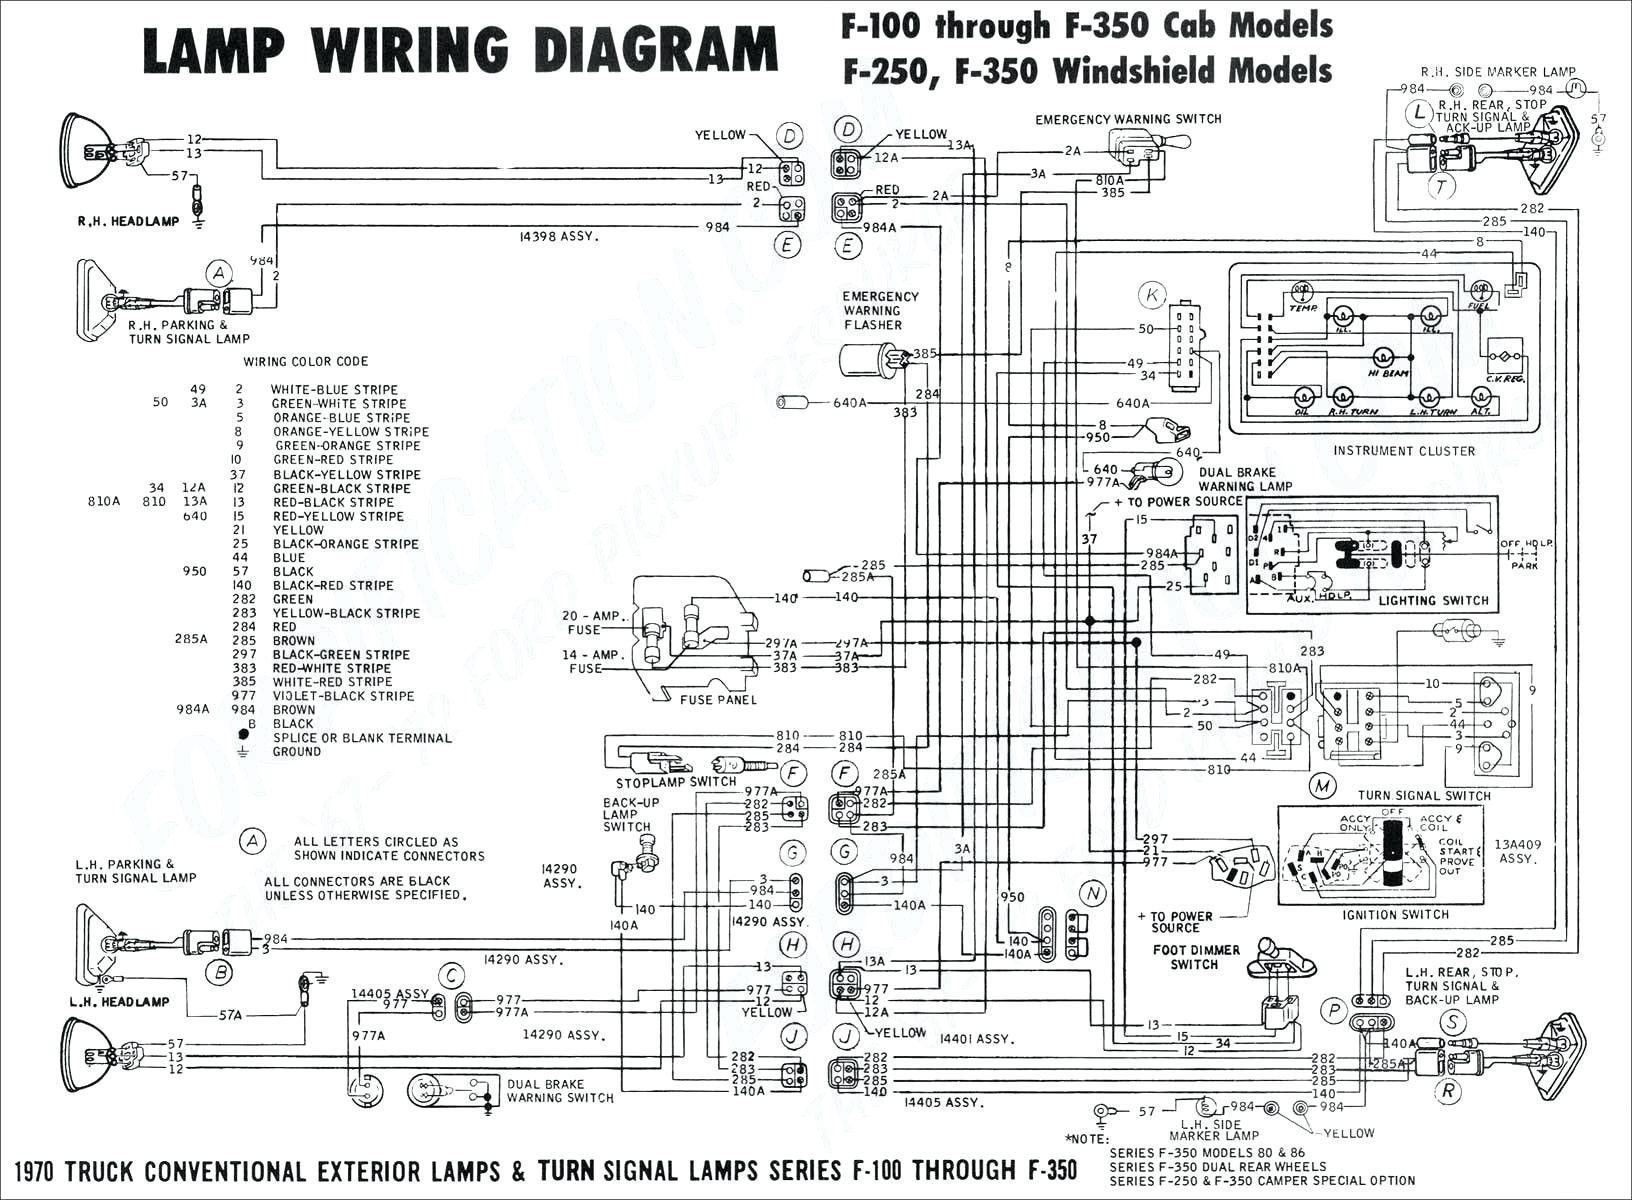 New Basic Electrical Wiring Diagram Diagram Wiringdiagram Diagramming Diagramm Visuals Electrical Wiring Diagram Electrical Diagram Trailer Wiring Diagram